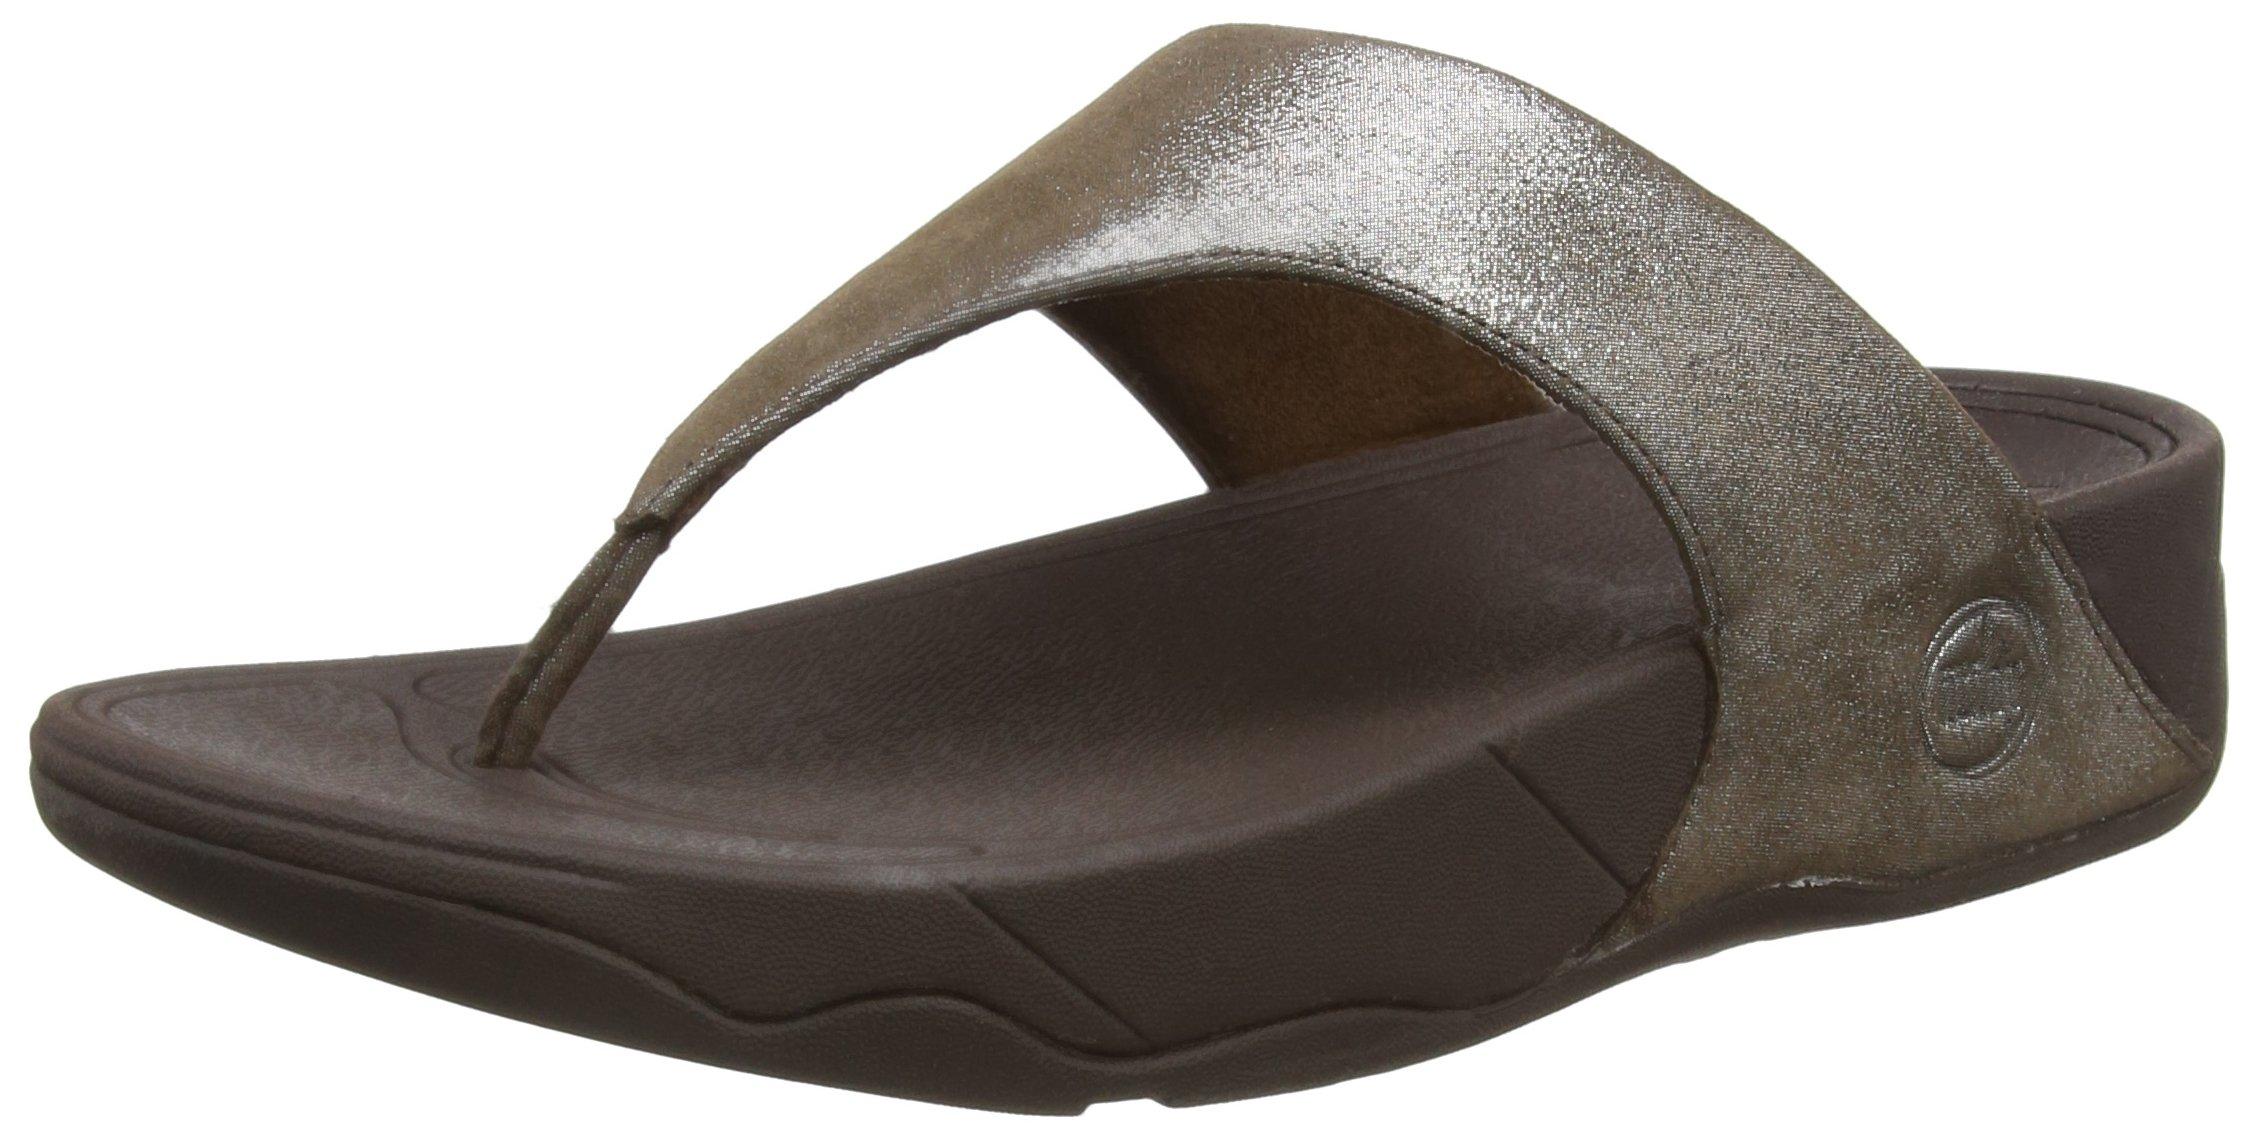 FitFlop Women's Lulu Shimmersuede Flip Flop, Bronze, 9 M US